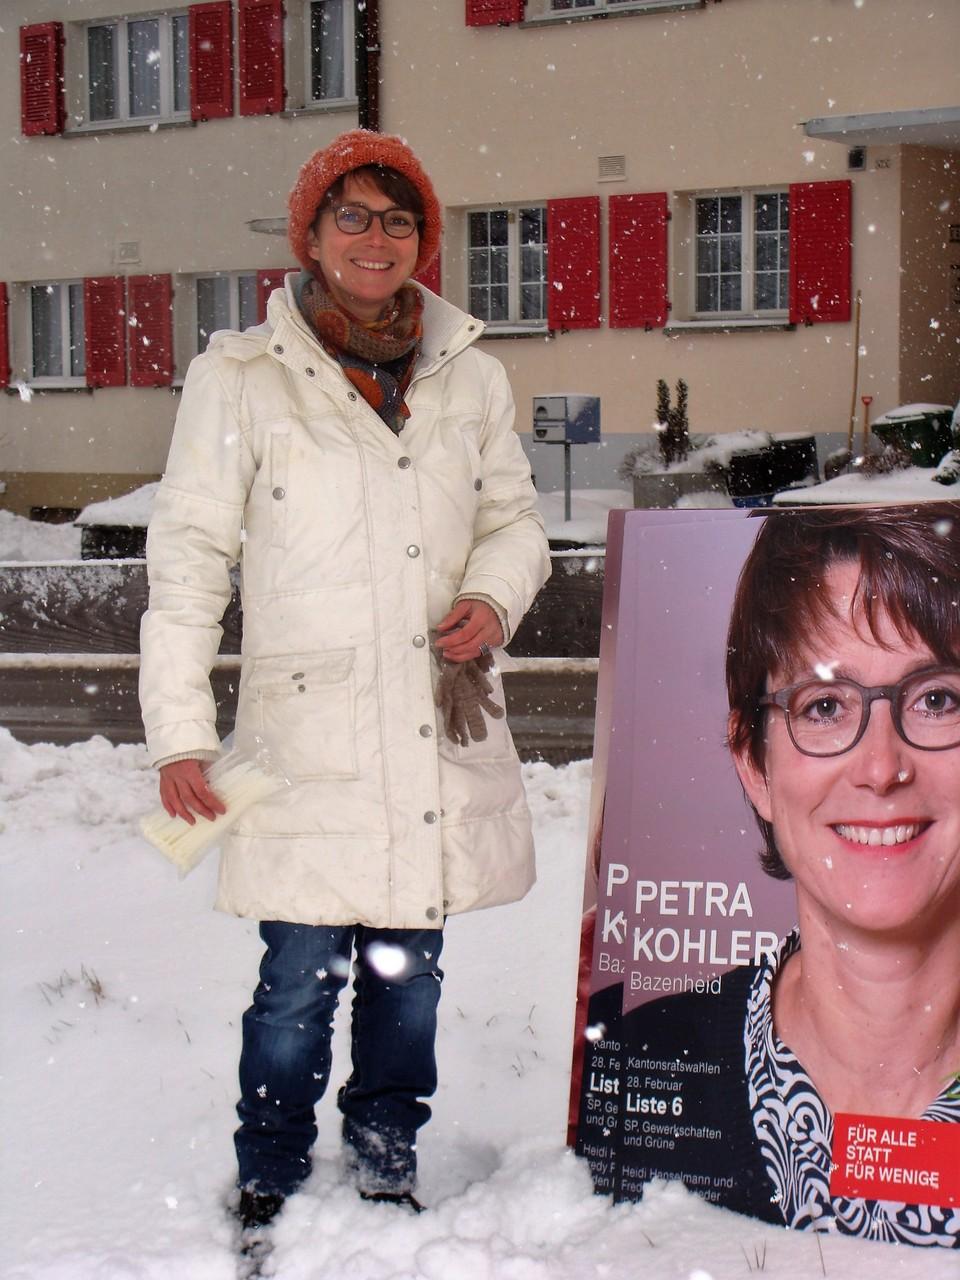 Petra Kohler